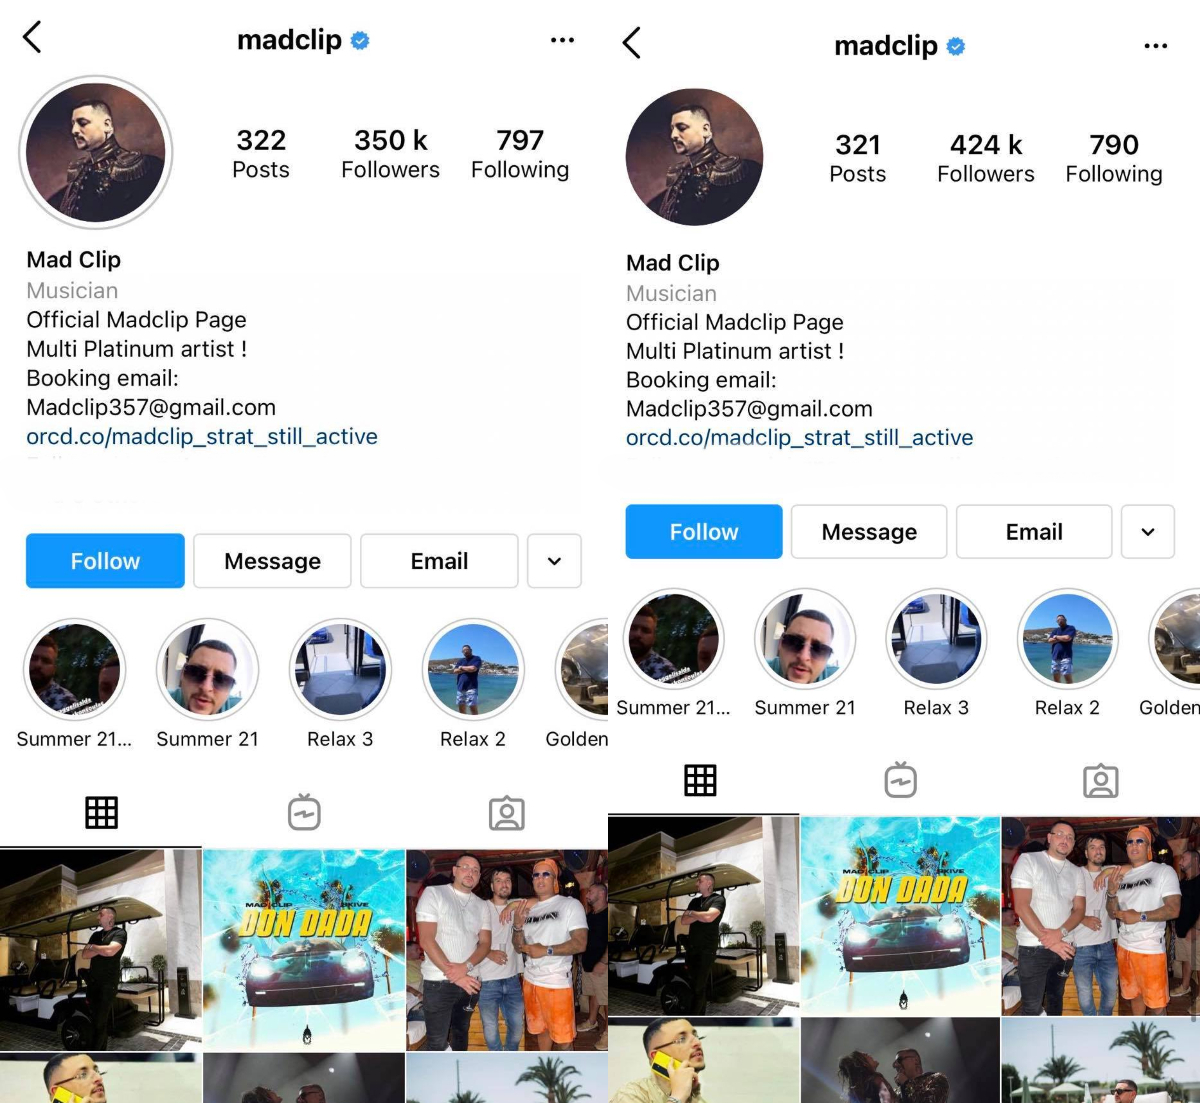 H αλλαγή στο instagram του Mad Clip 5 ημέρες μετά τον θάνατό του (Pic)